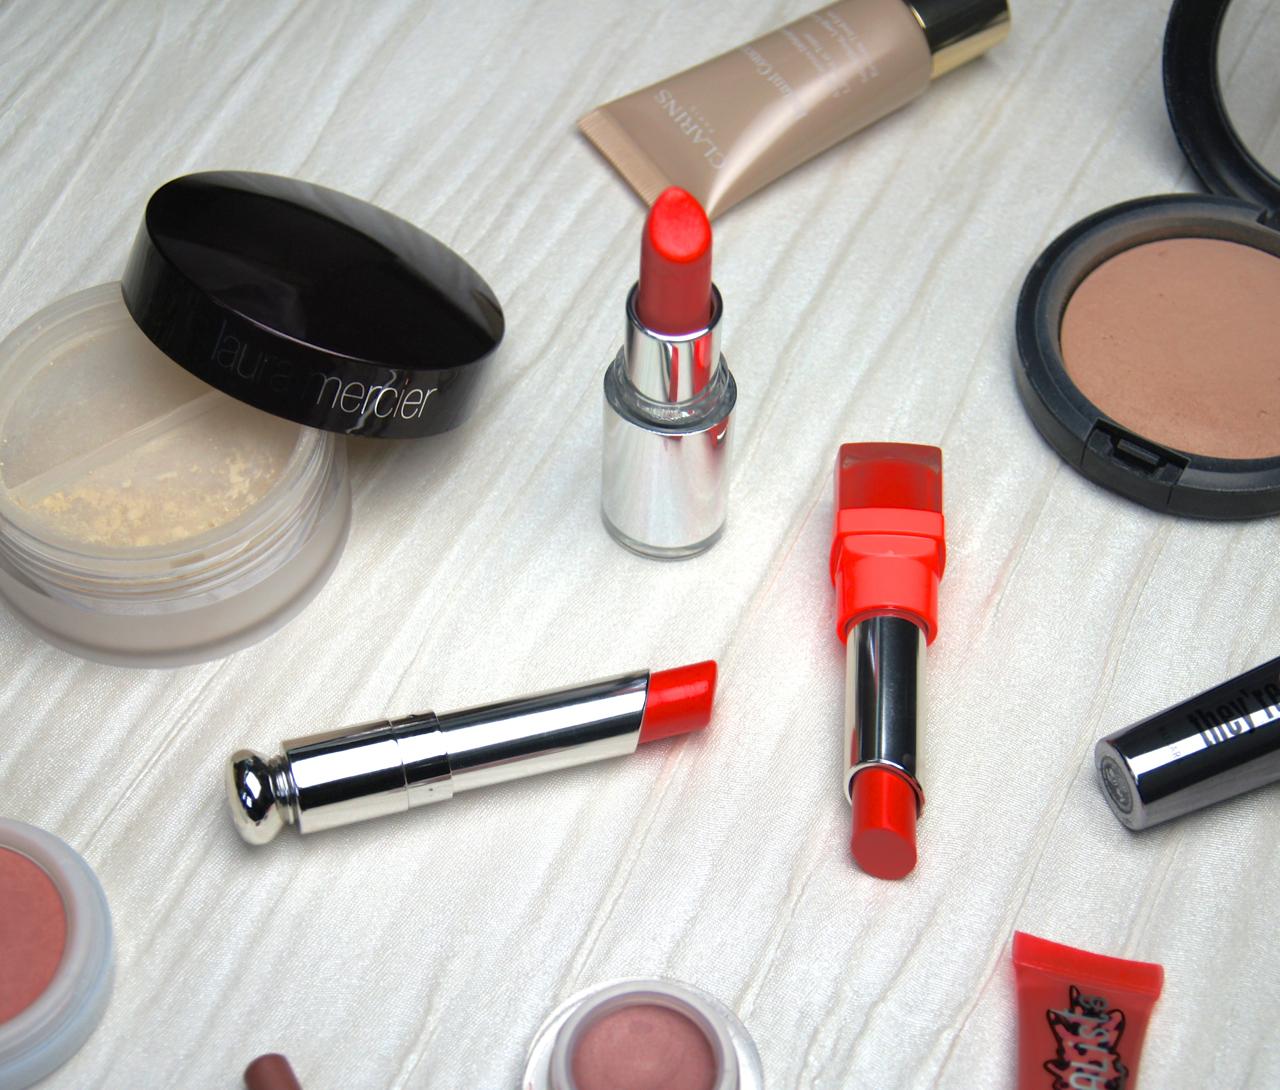 glossy coral lipsticks dior clarins bourjois swatches save spend splurge  affordable luxury mid-range